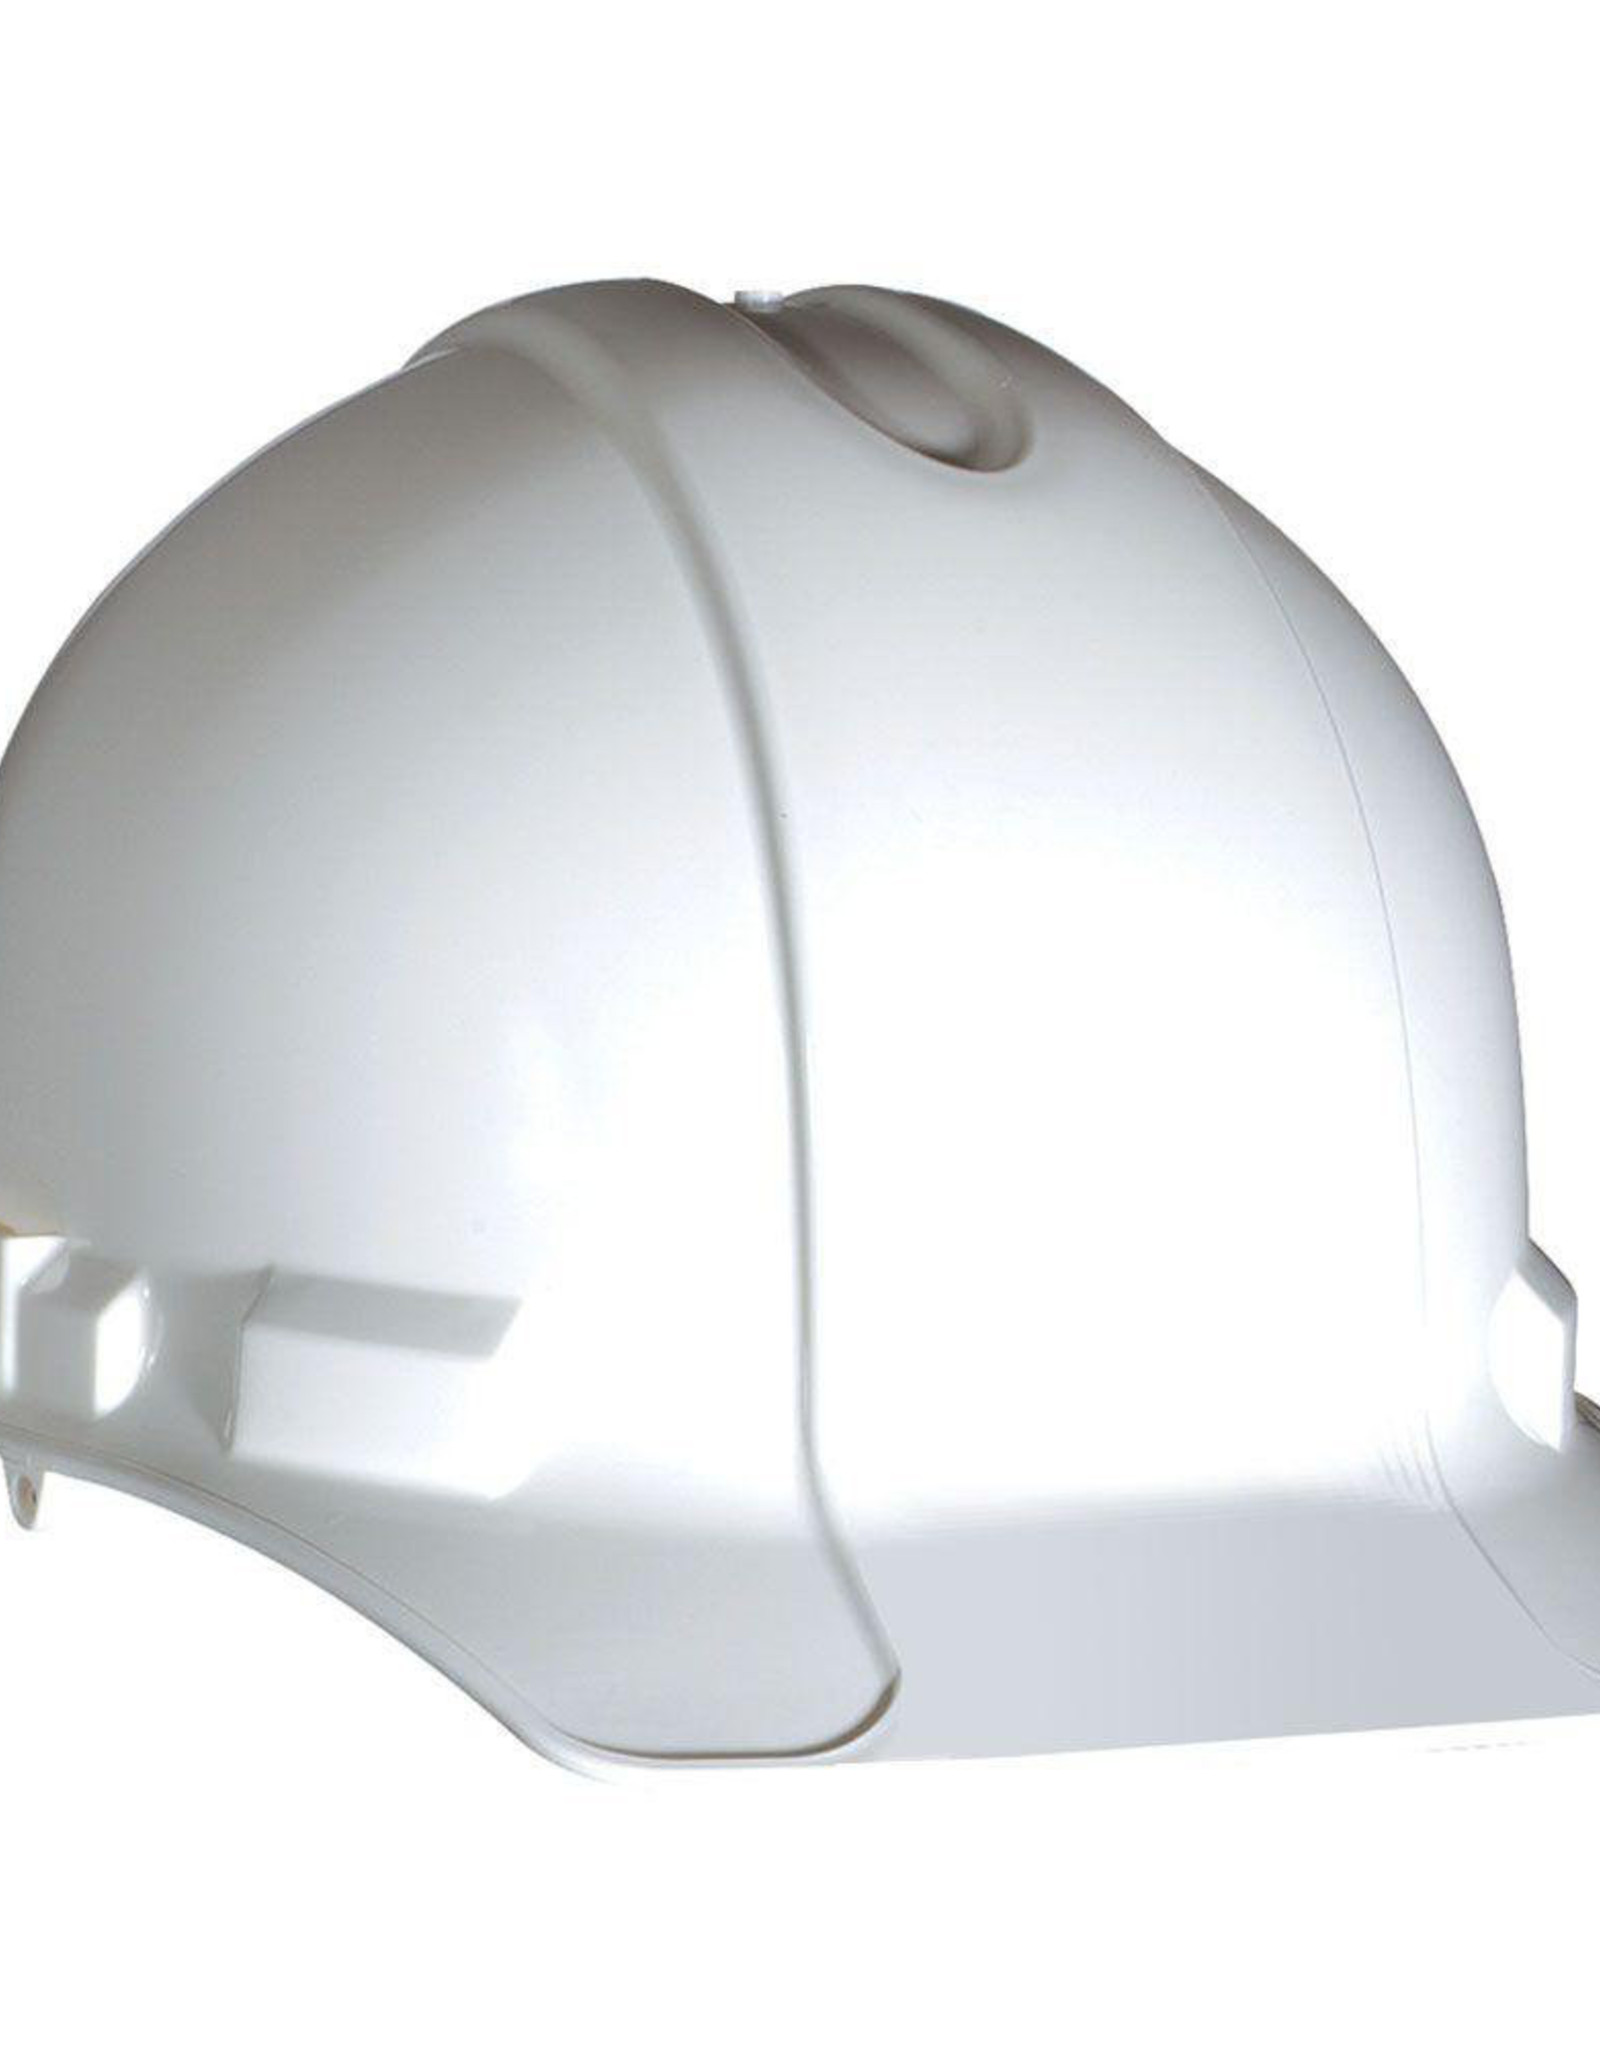 Standard Safety Helmet, Pin Lock Suspension, White Shell